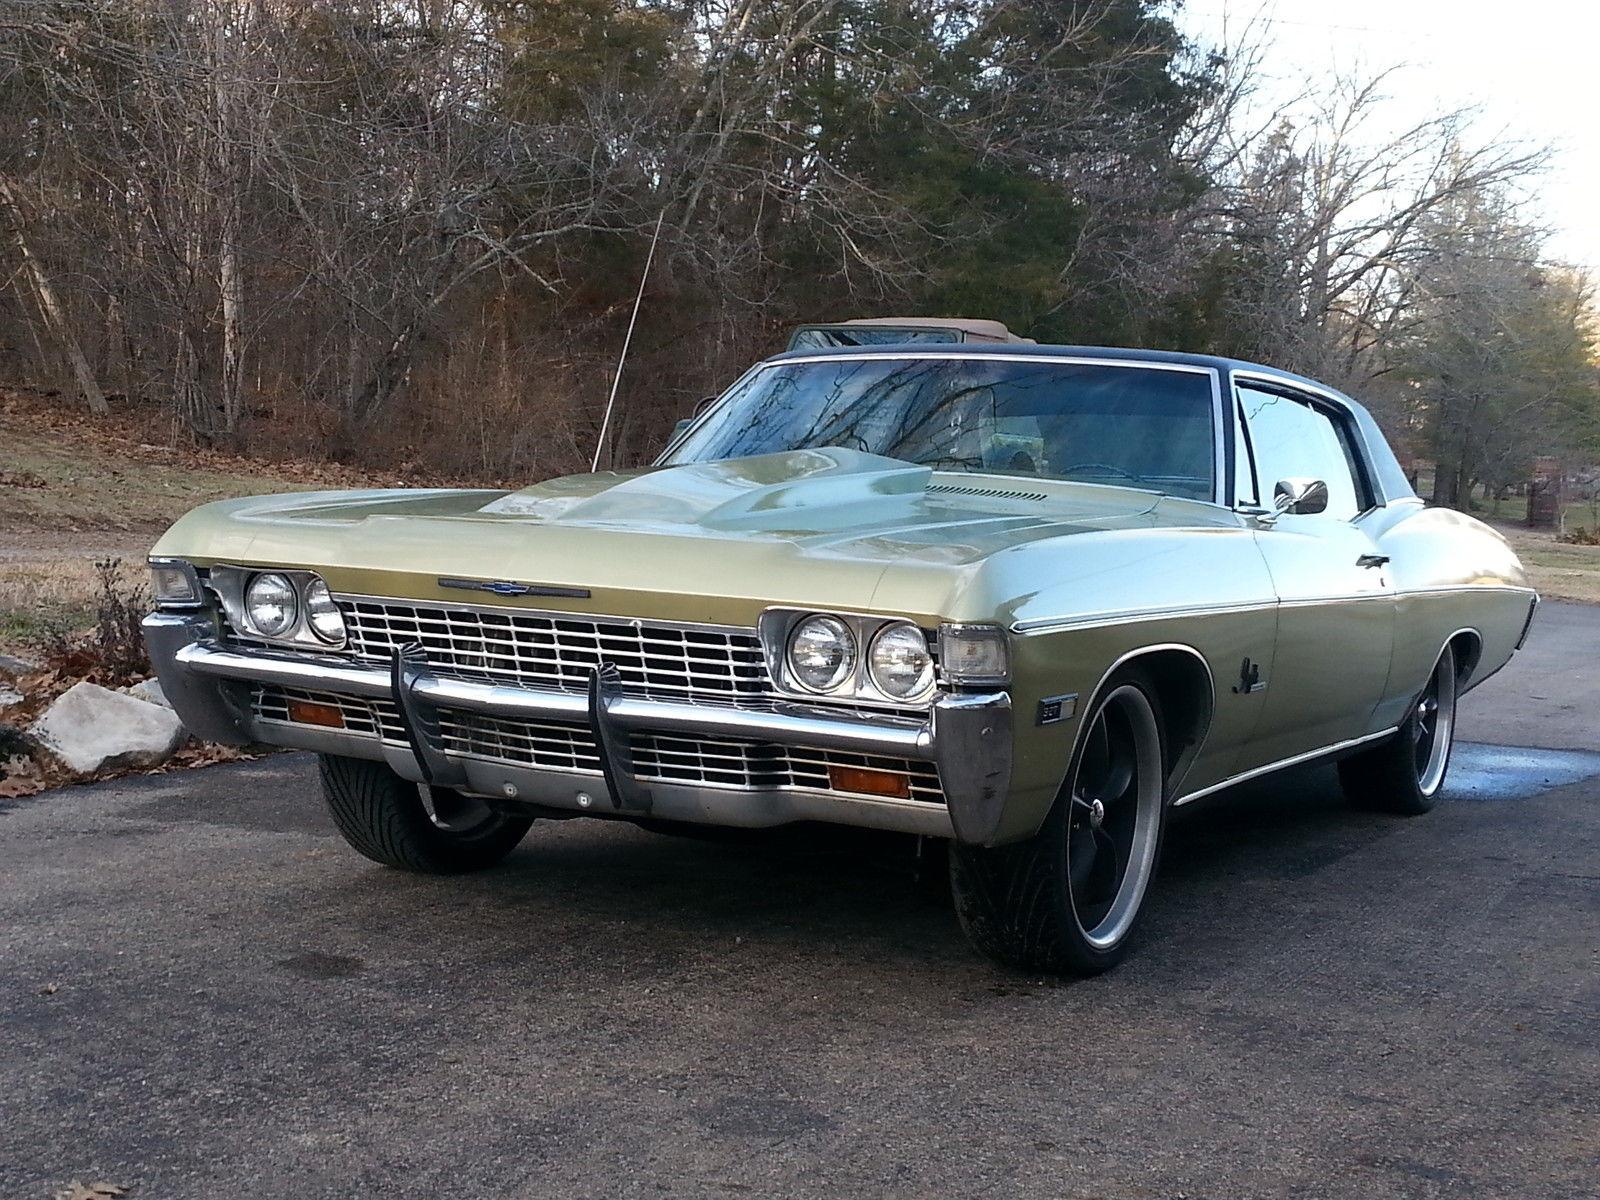 1968 impala 8 1 ls 4l80e classic chevrolet impala 1968 for sale. Black Bedroom Furniture Sets. Home Design Ideas